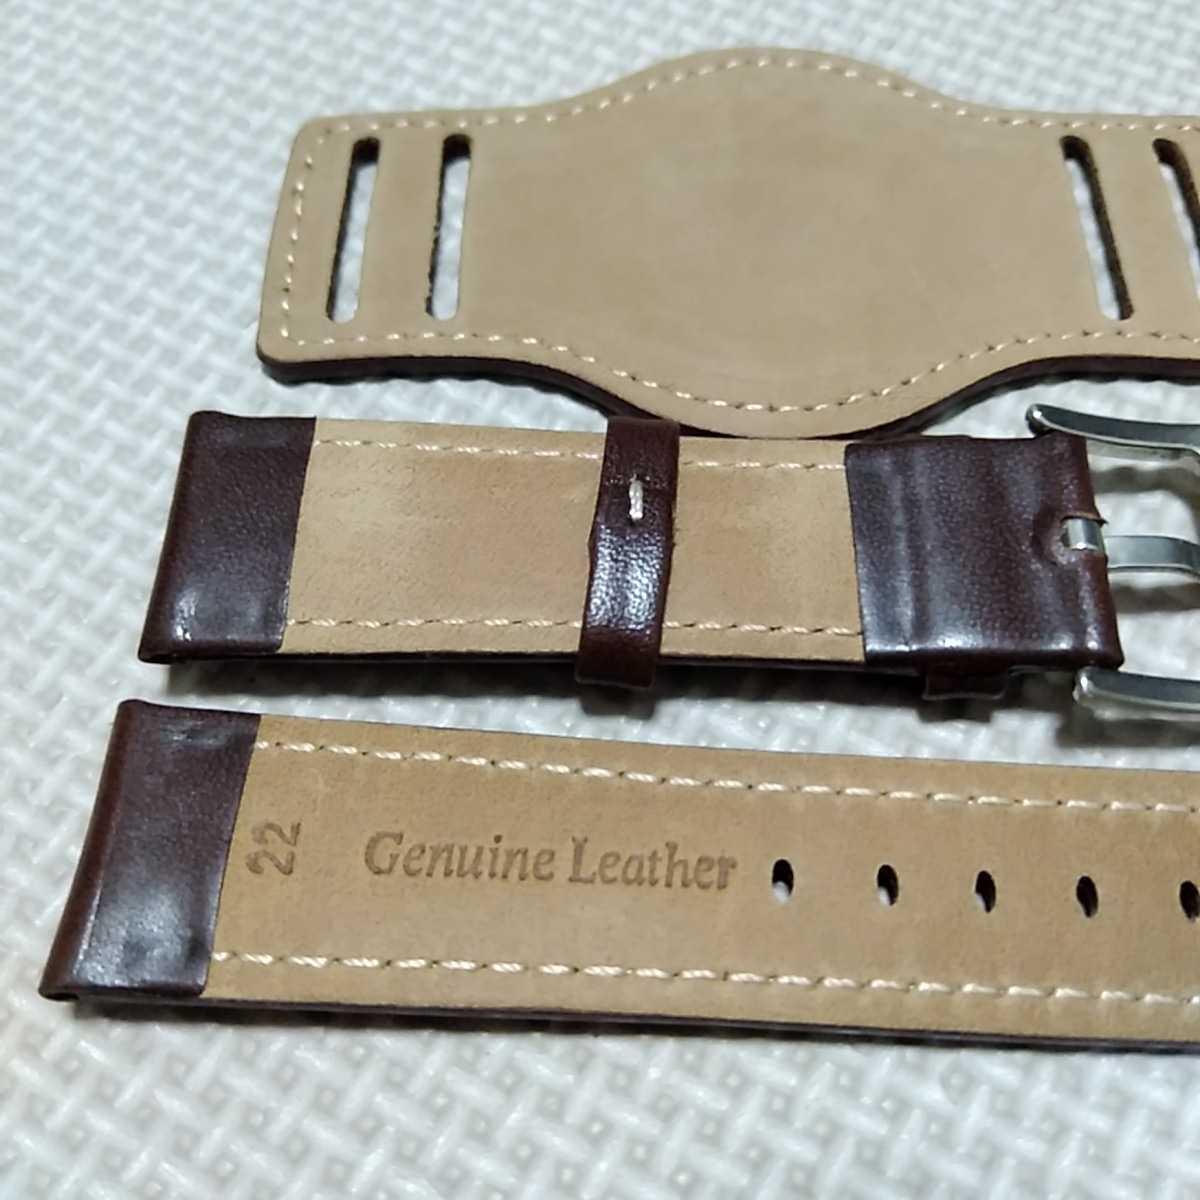 No50 ブンド BUND 本革レザーベルト 腕時計ベルト 交換用ストラップ ブラウン 22mm 未使用 高品質 ドイツパイロット 空軍_画像5